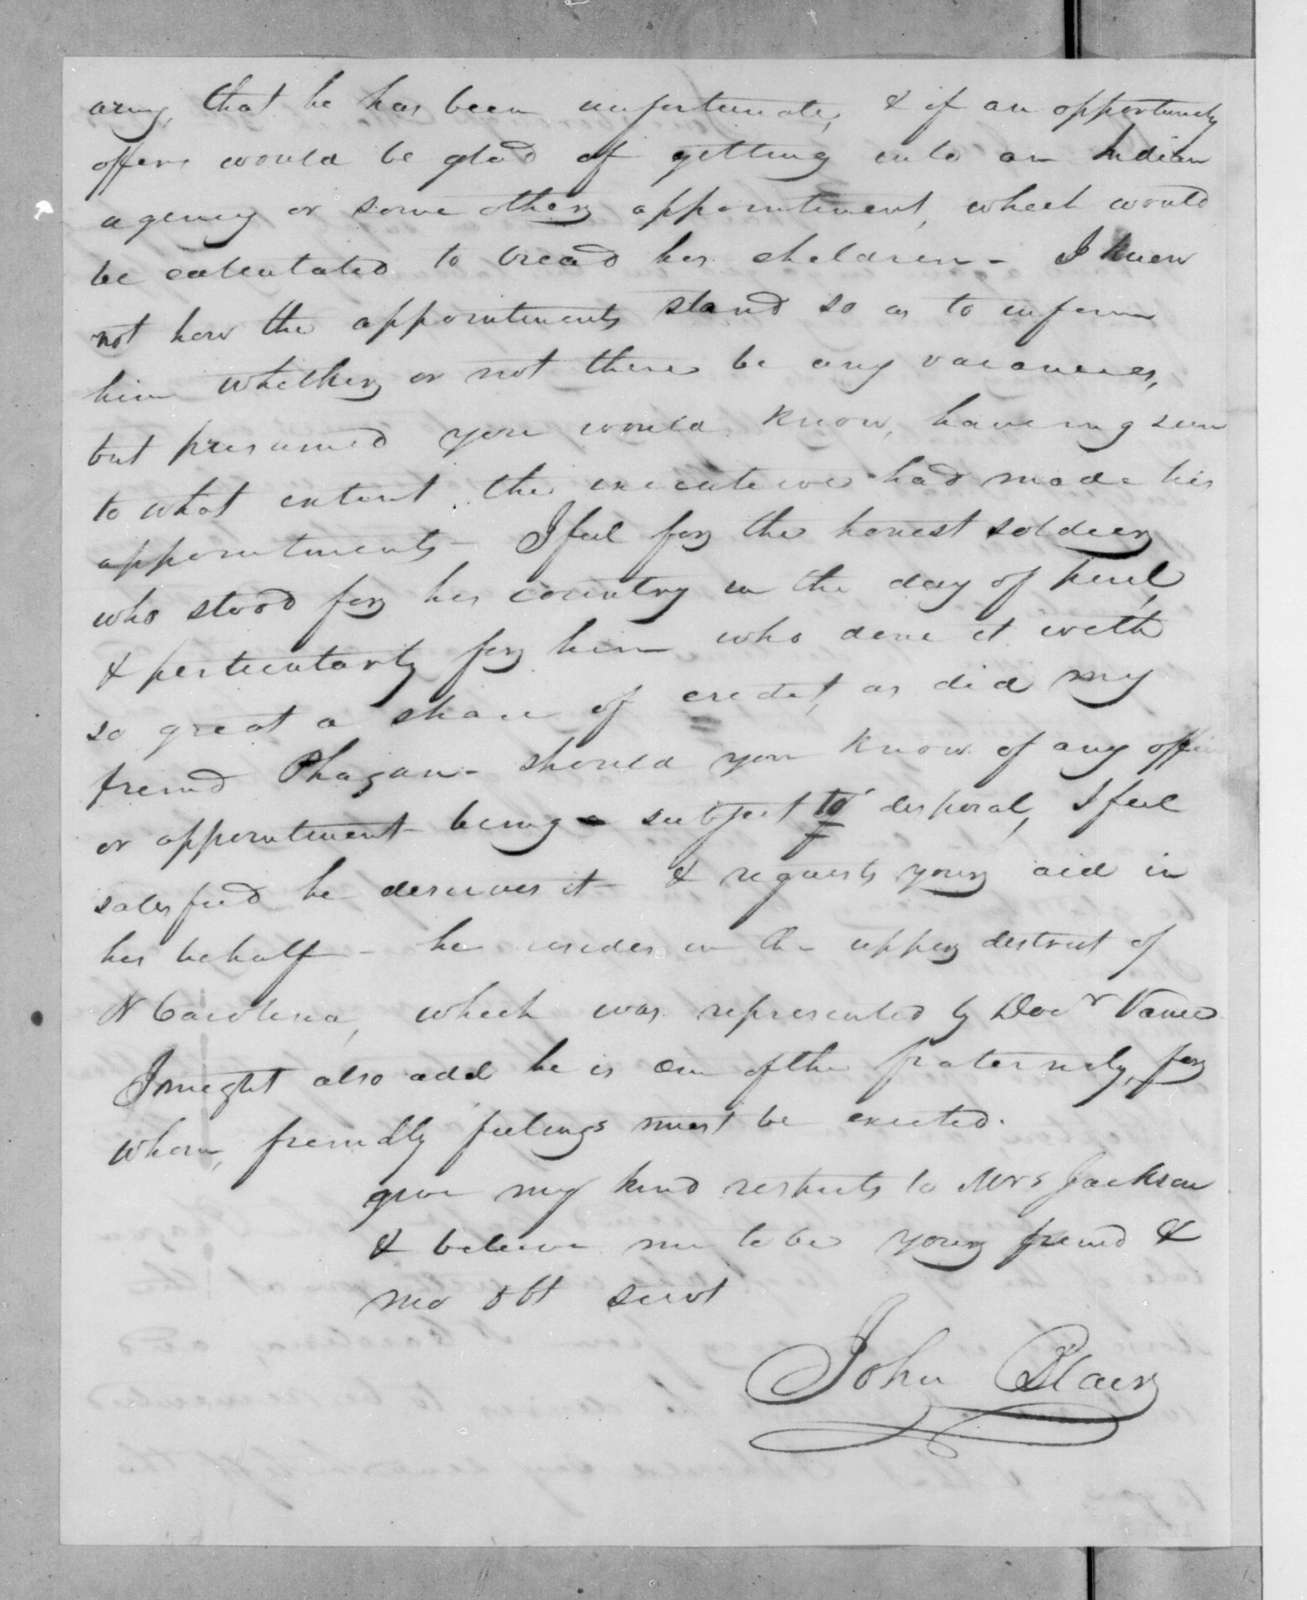 John Blair to Andrew Jackson, March 30, 1825